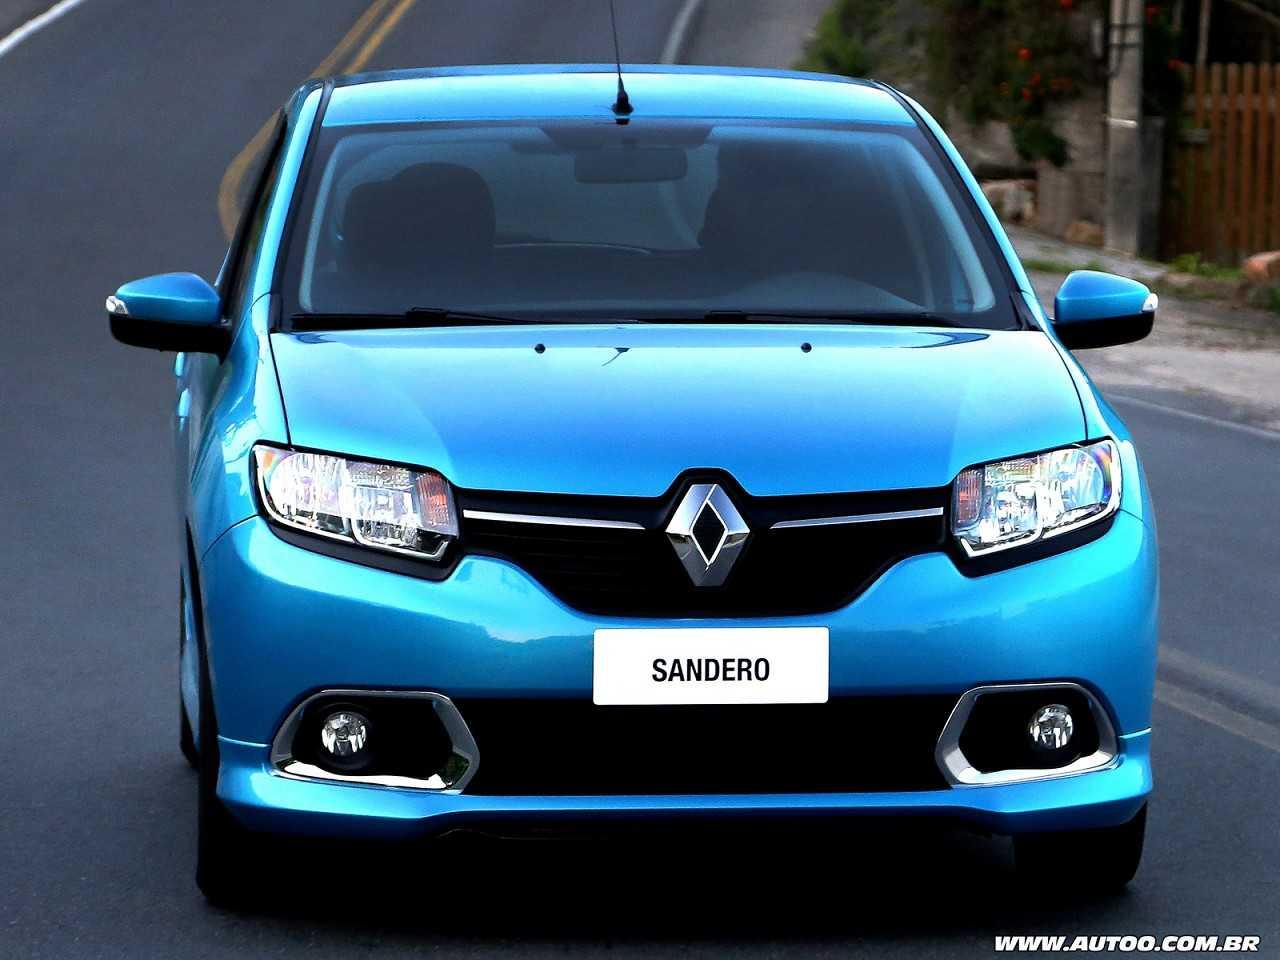 RenaultSandero 2016 - ângulo frontal